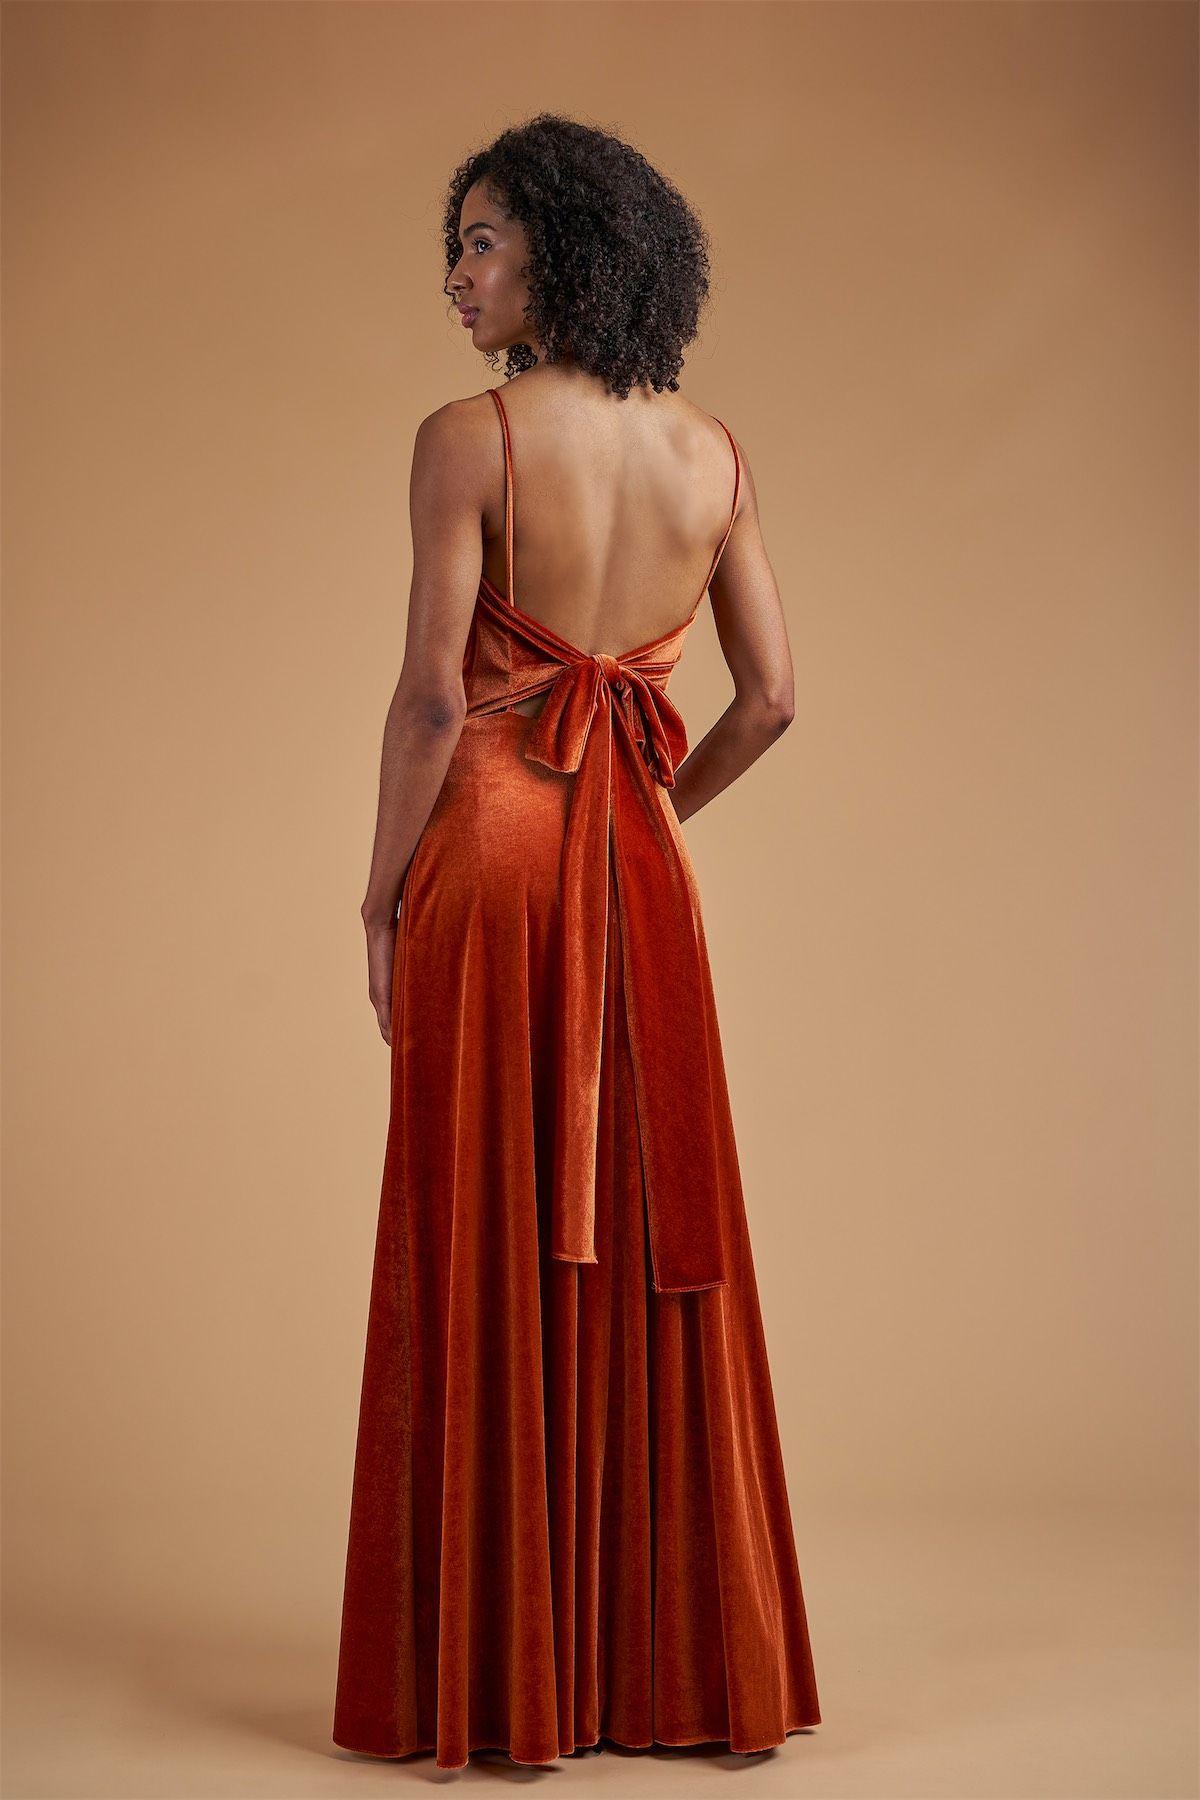 B223066 Stretch Velvet Sweetheart Spaghetti Strap Dress With Long Tie Back Burnt Orange Bridesmaid Dresses Velvet Bridesmaid Dresses Orange Bridesmaid Dresses [ 1800 x 1200 Pixel ]